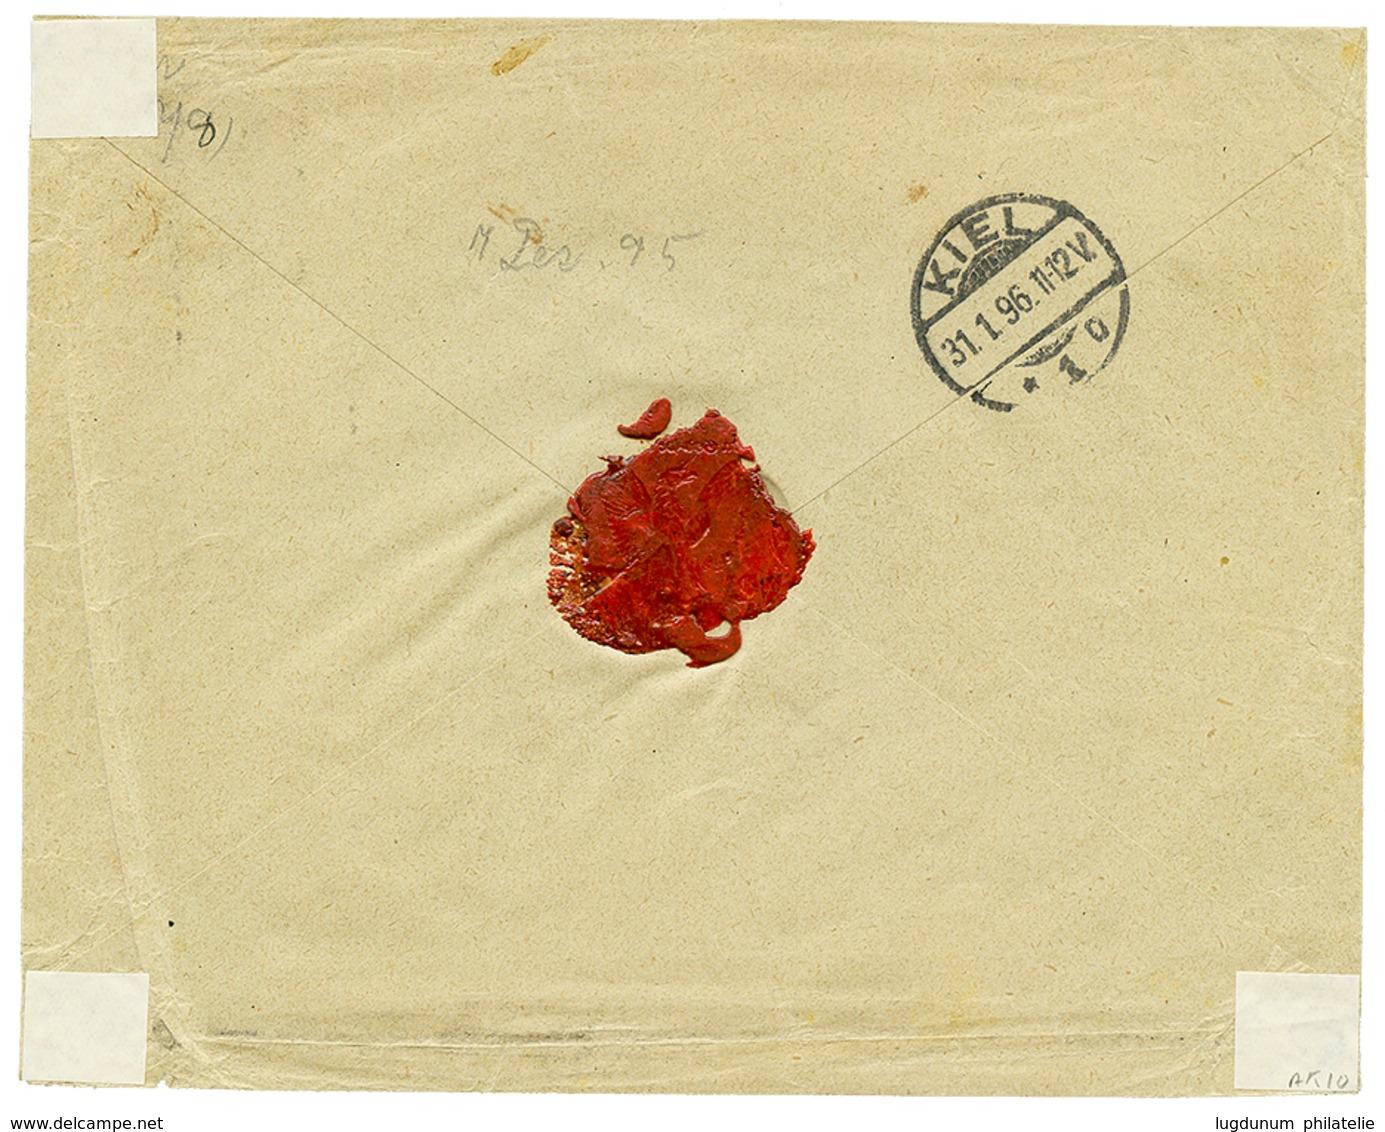 """SAMOA - DAVIS POST"" : 1896 2d(x2)+ 2 1/2d(x2) Canc. APIA On Envelope To GERMANY. Superb. - Samoa"